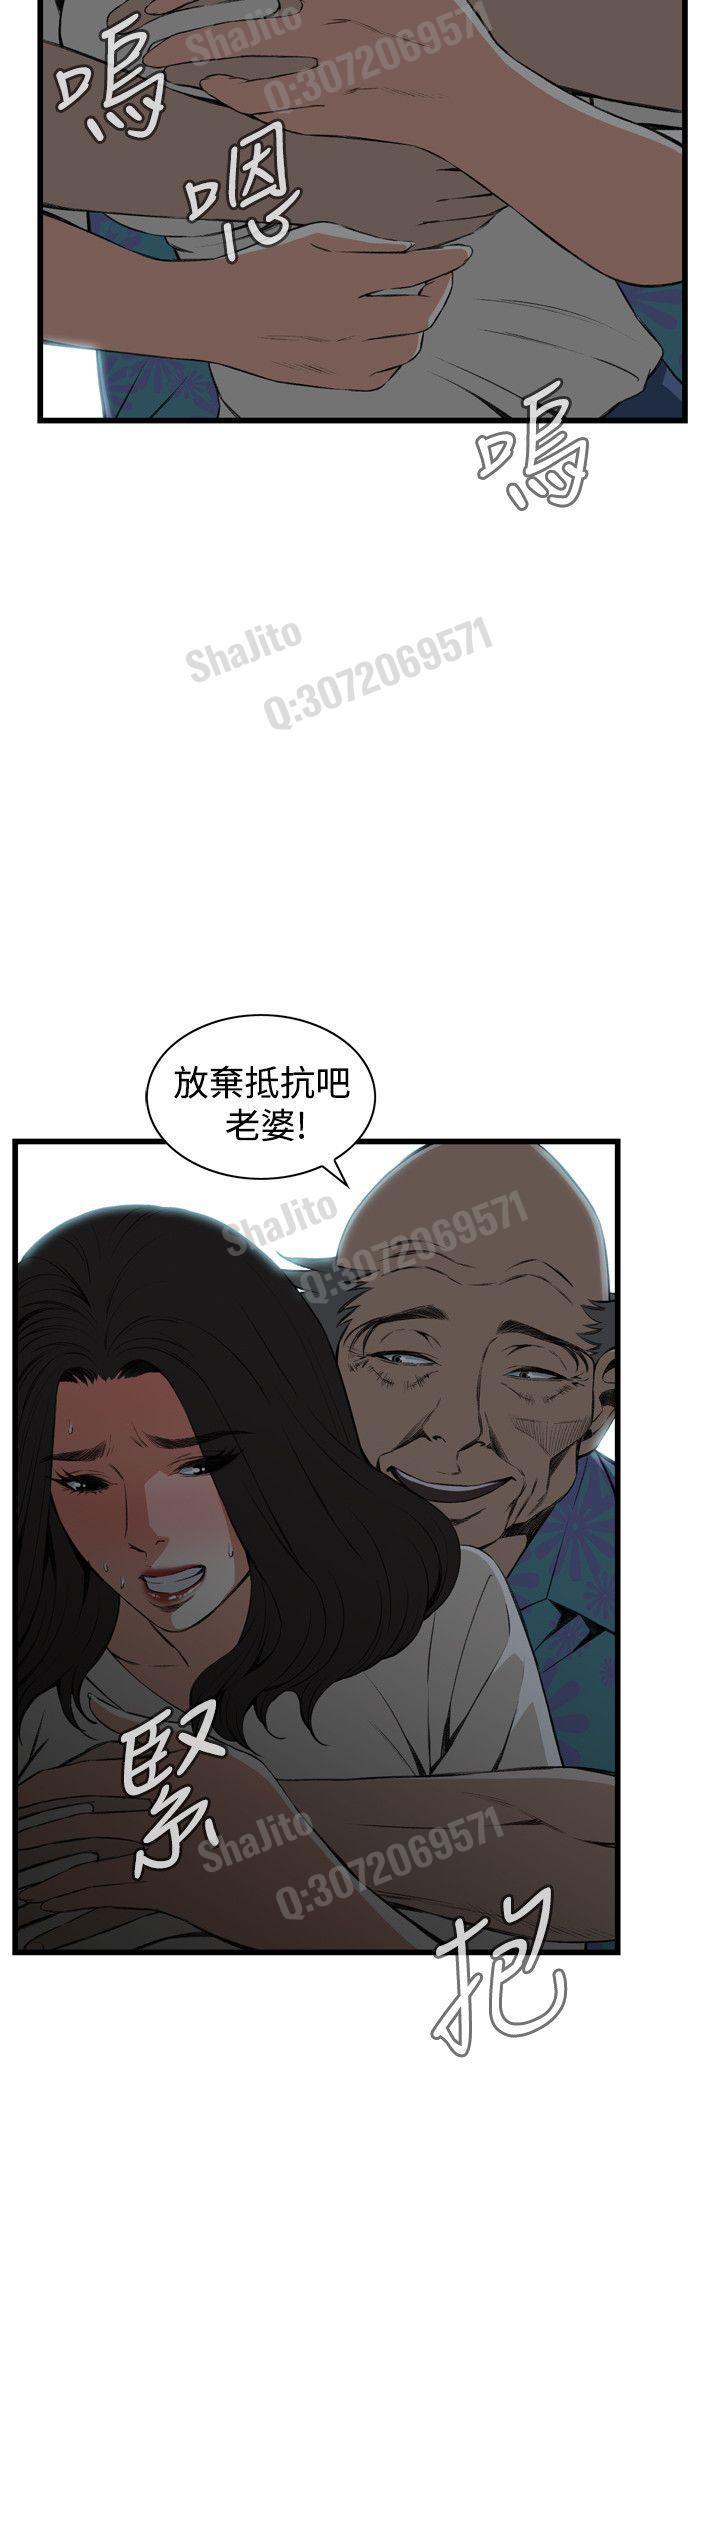 Take a peek 偷窥67-69 Chinese 4